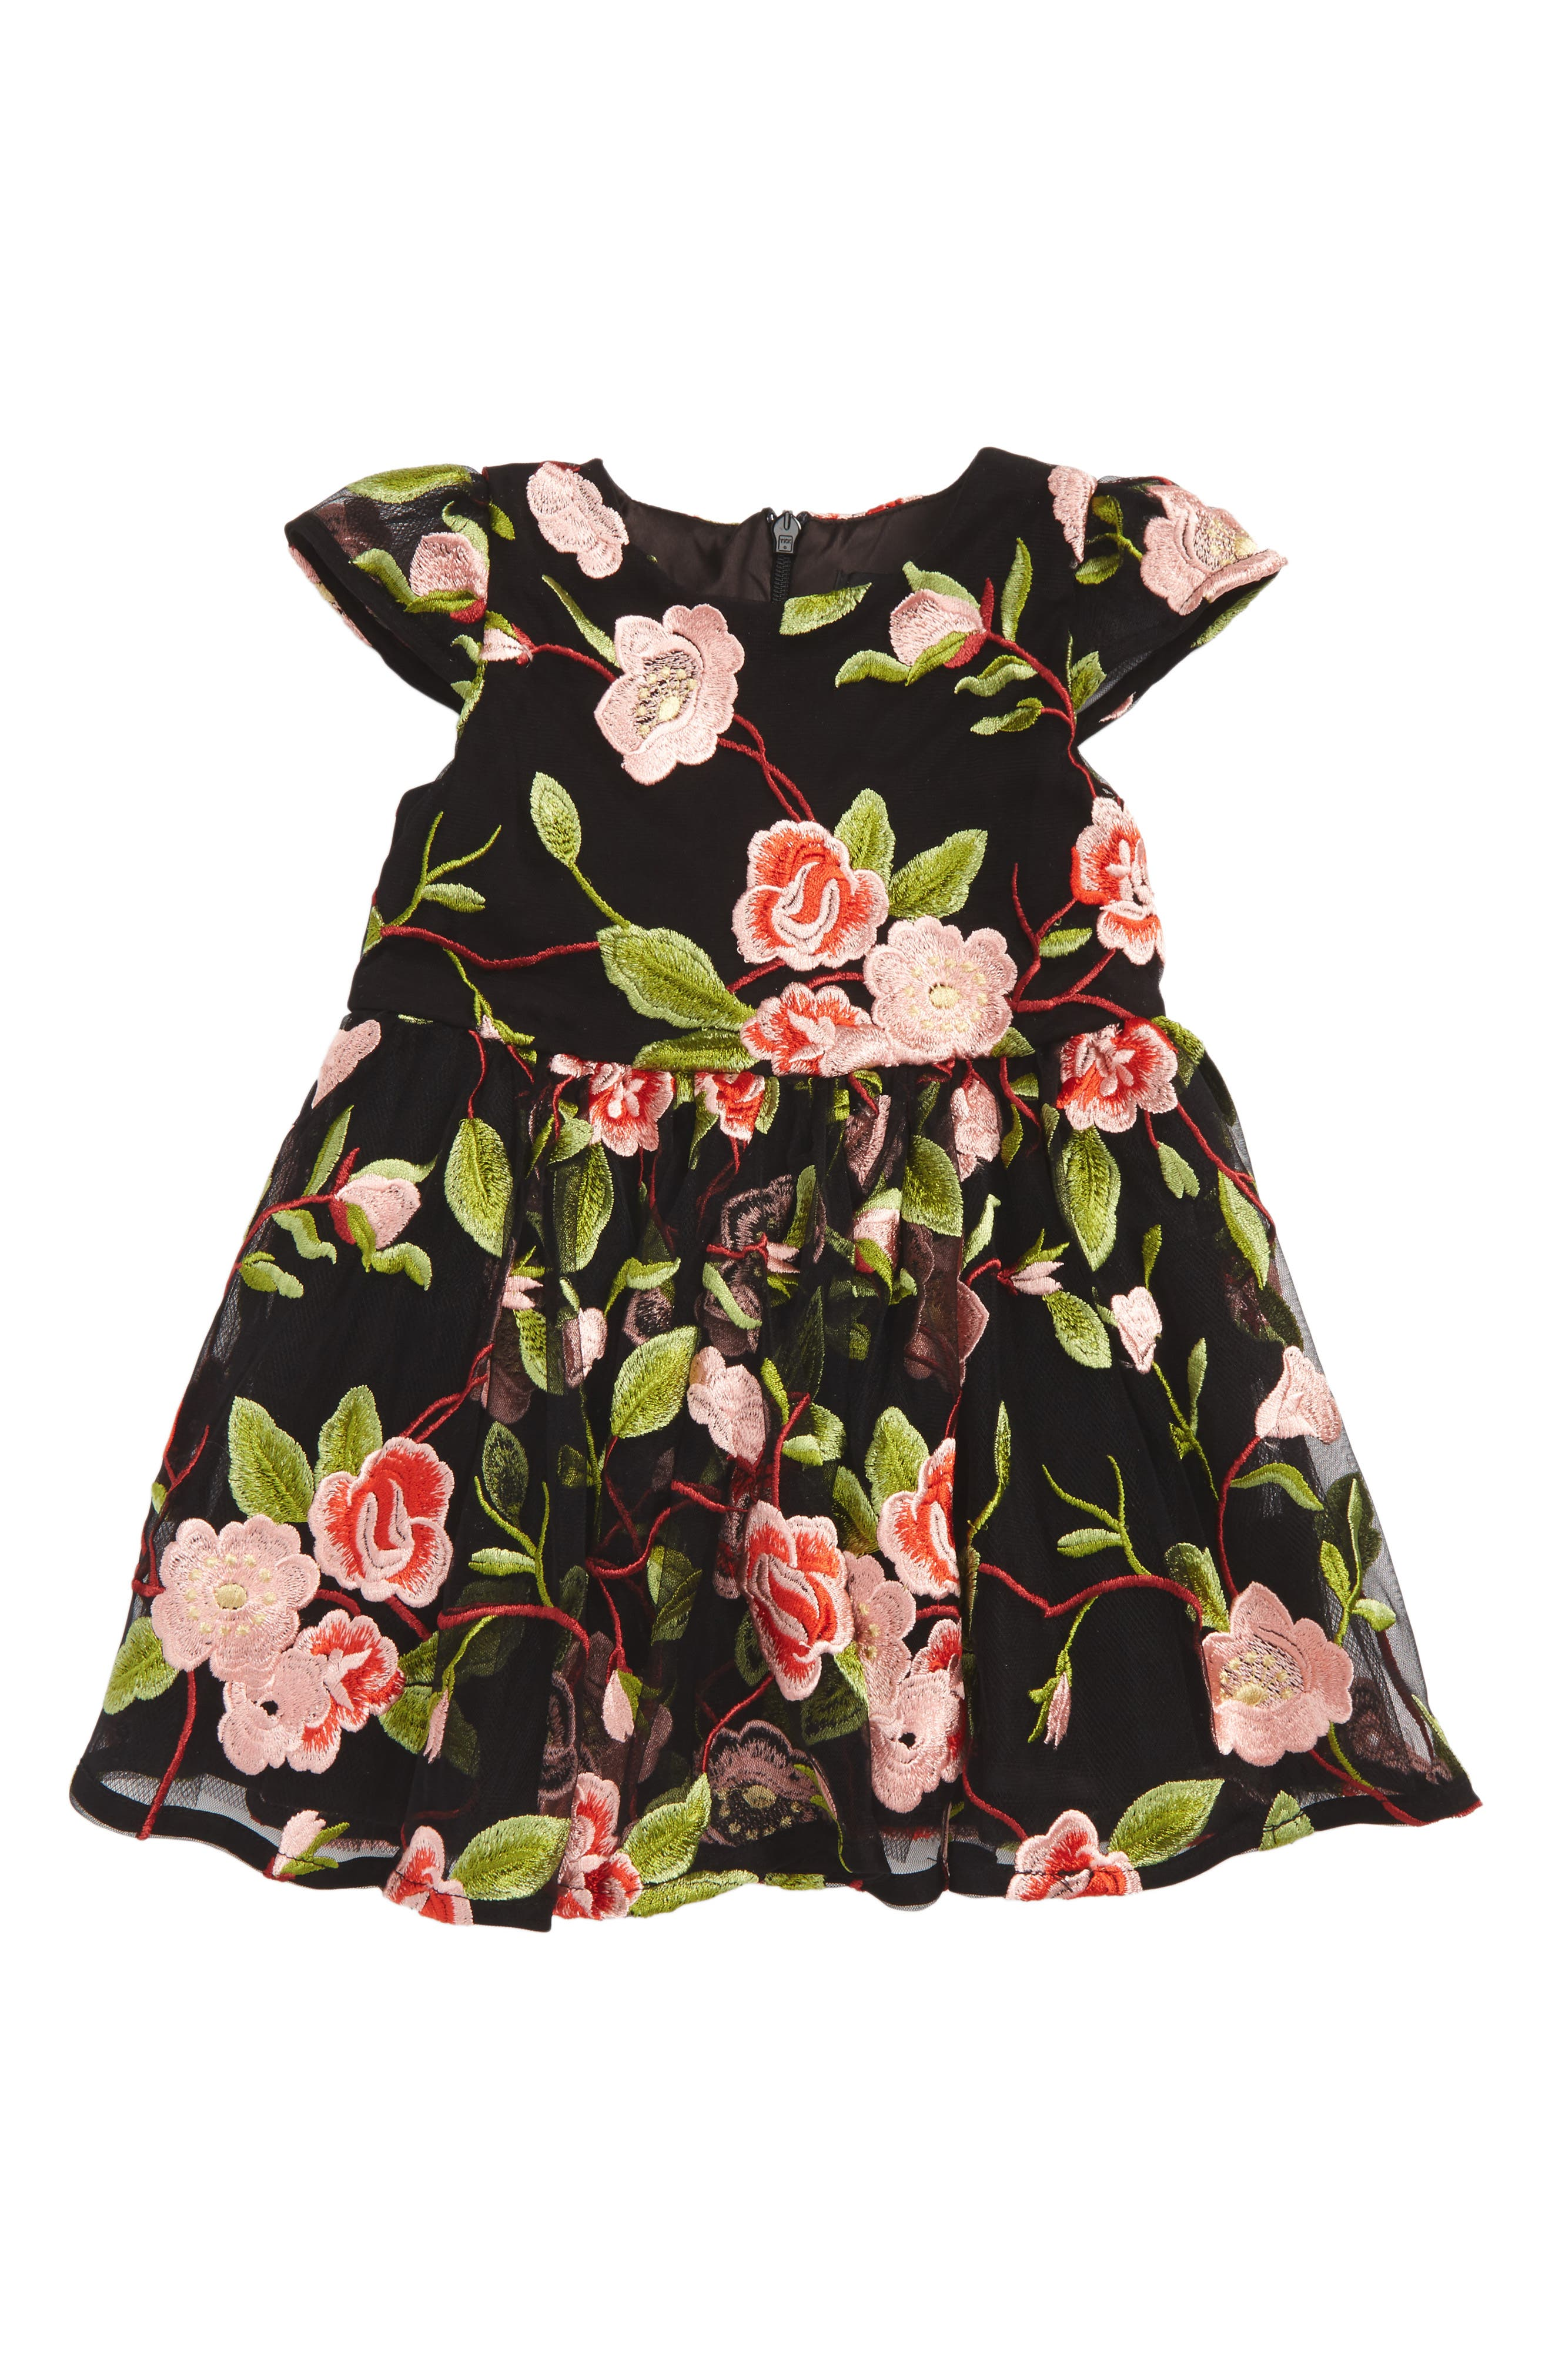 Main Image - Bardot Junior Holly Floral Dress (Baby Girls & Toddler Girls)